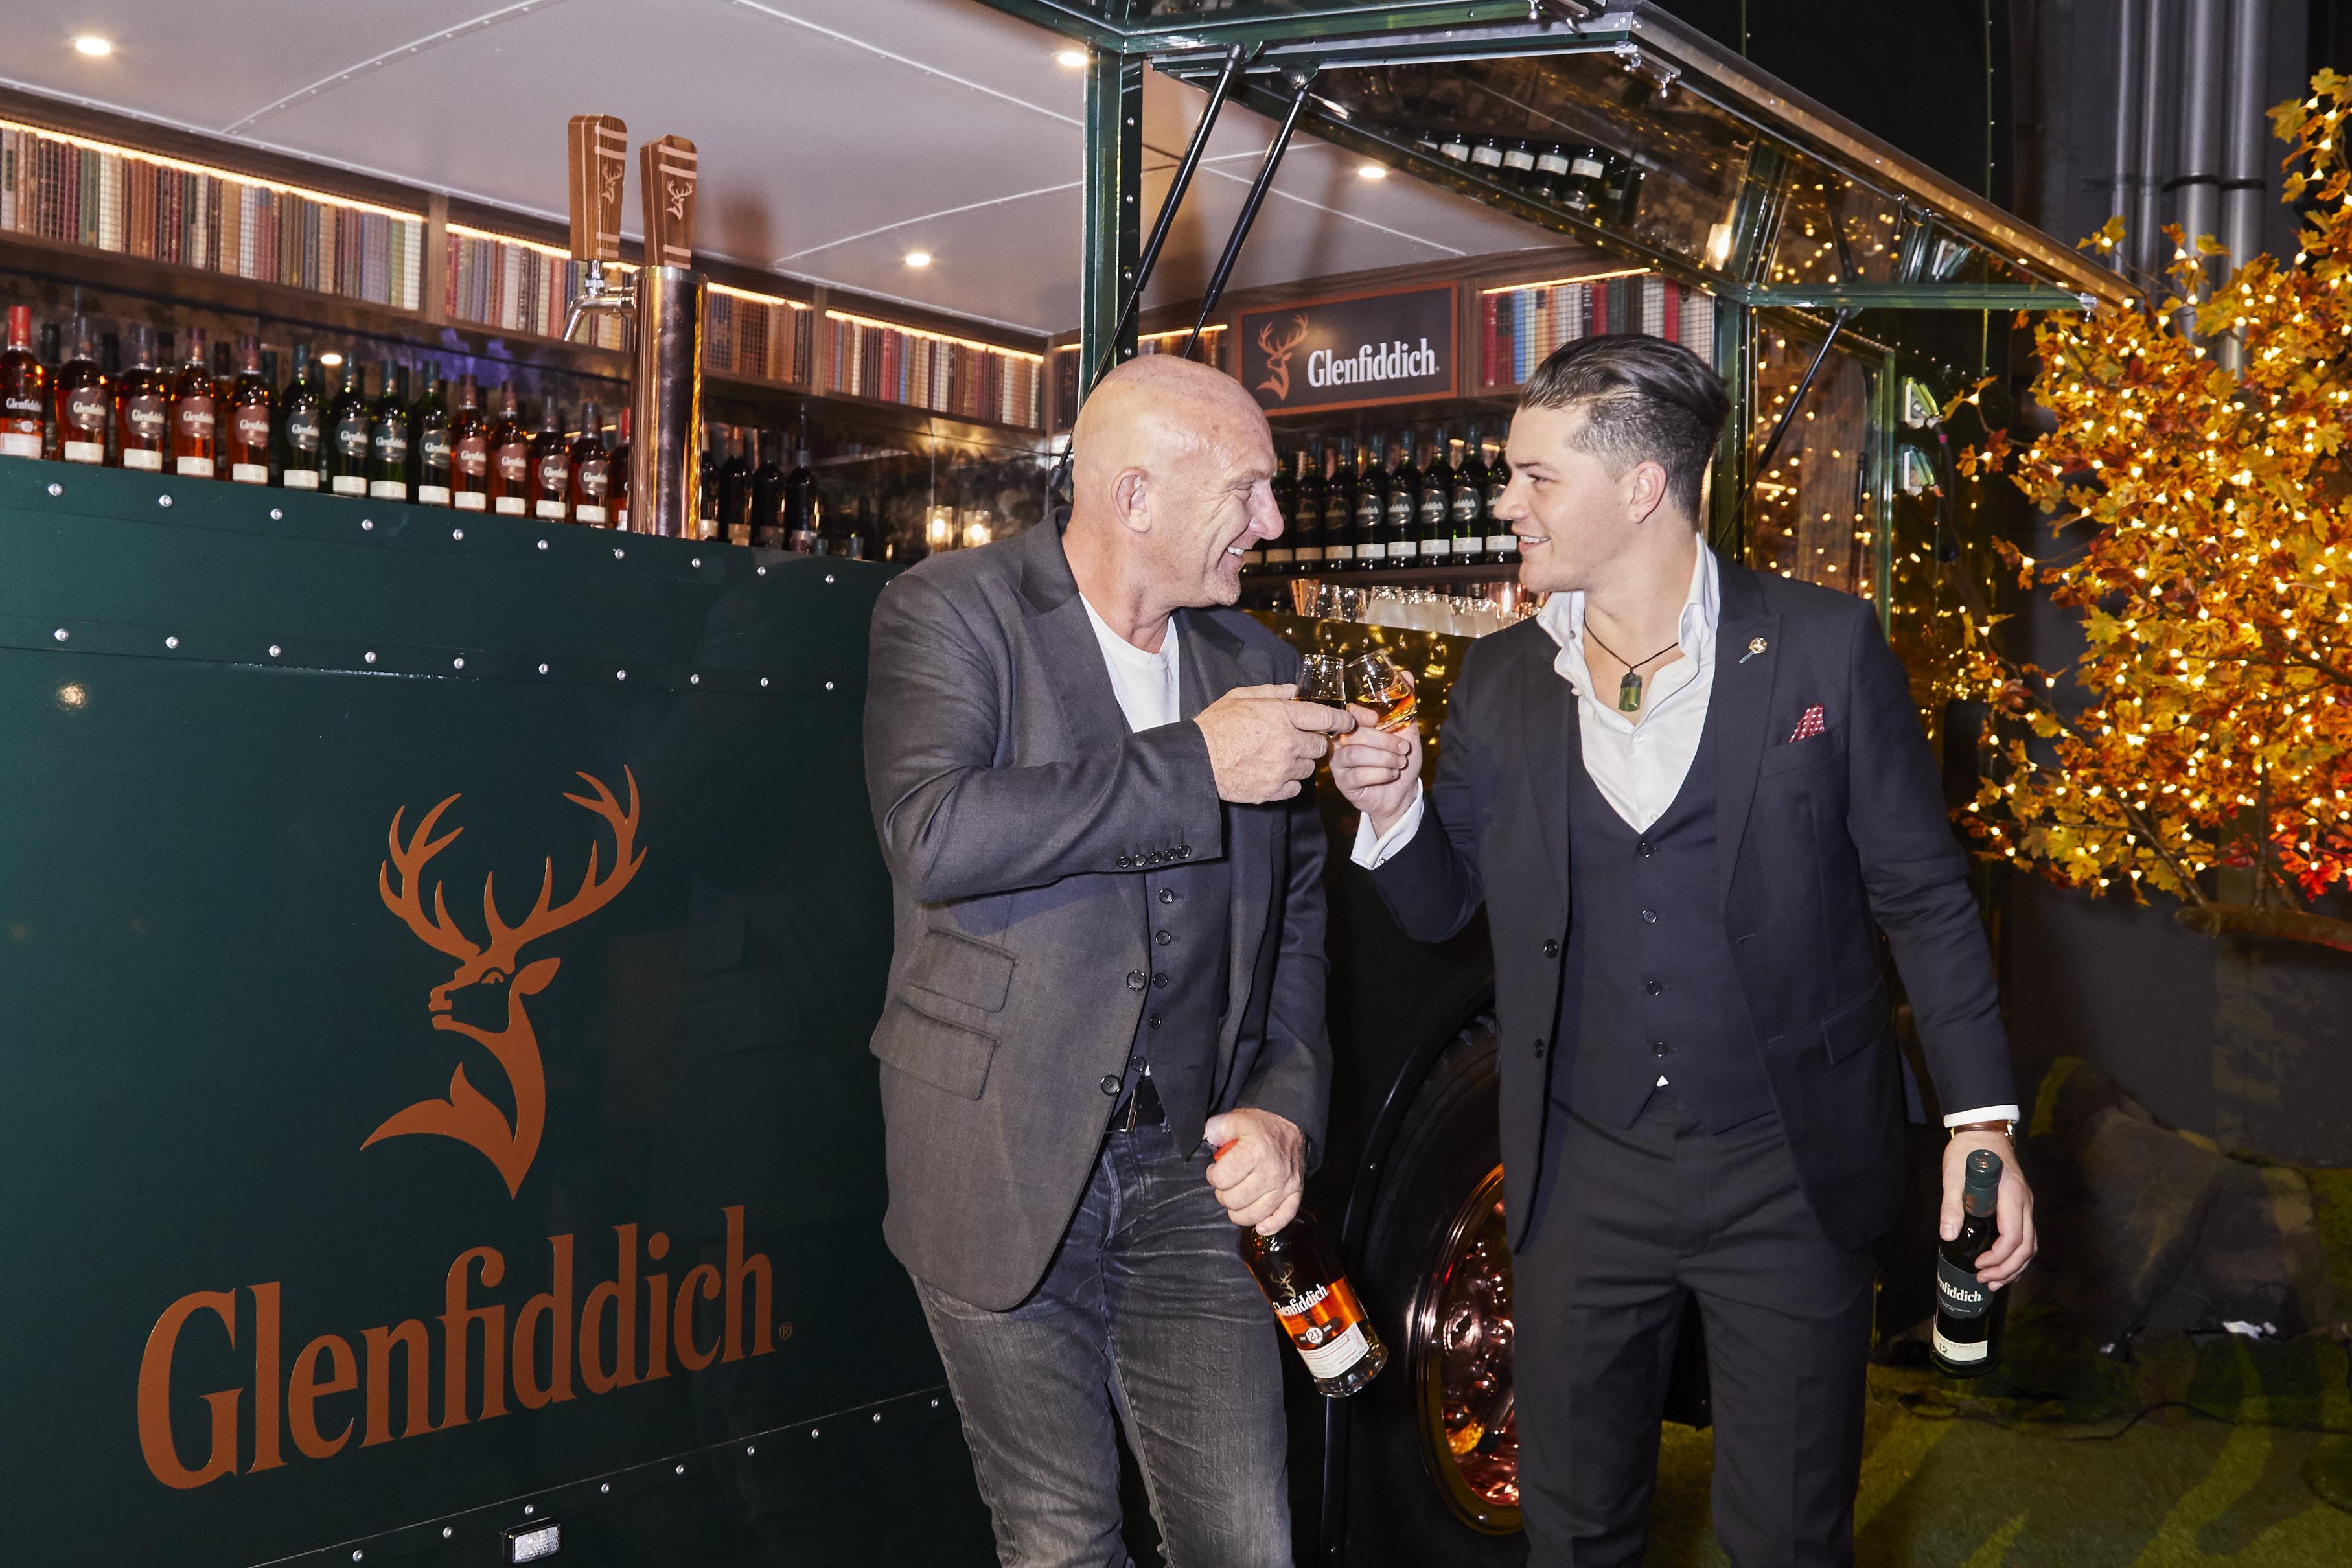 Matt Moran and Glenfiddich Brand Ambassador Luke Sanderson enjoying a dram by the Glenfiddich Whisky Wanderer.